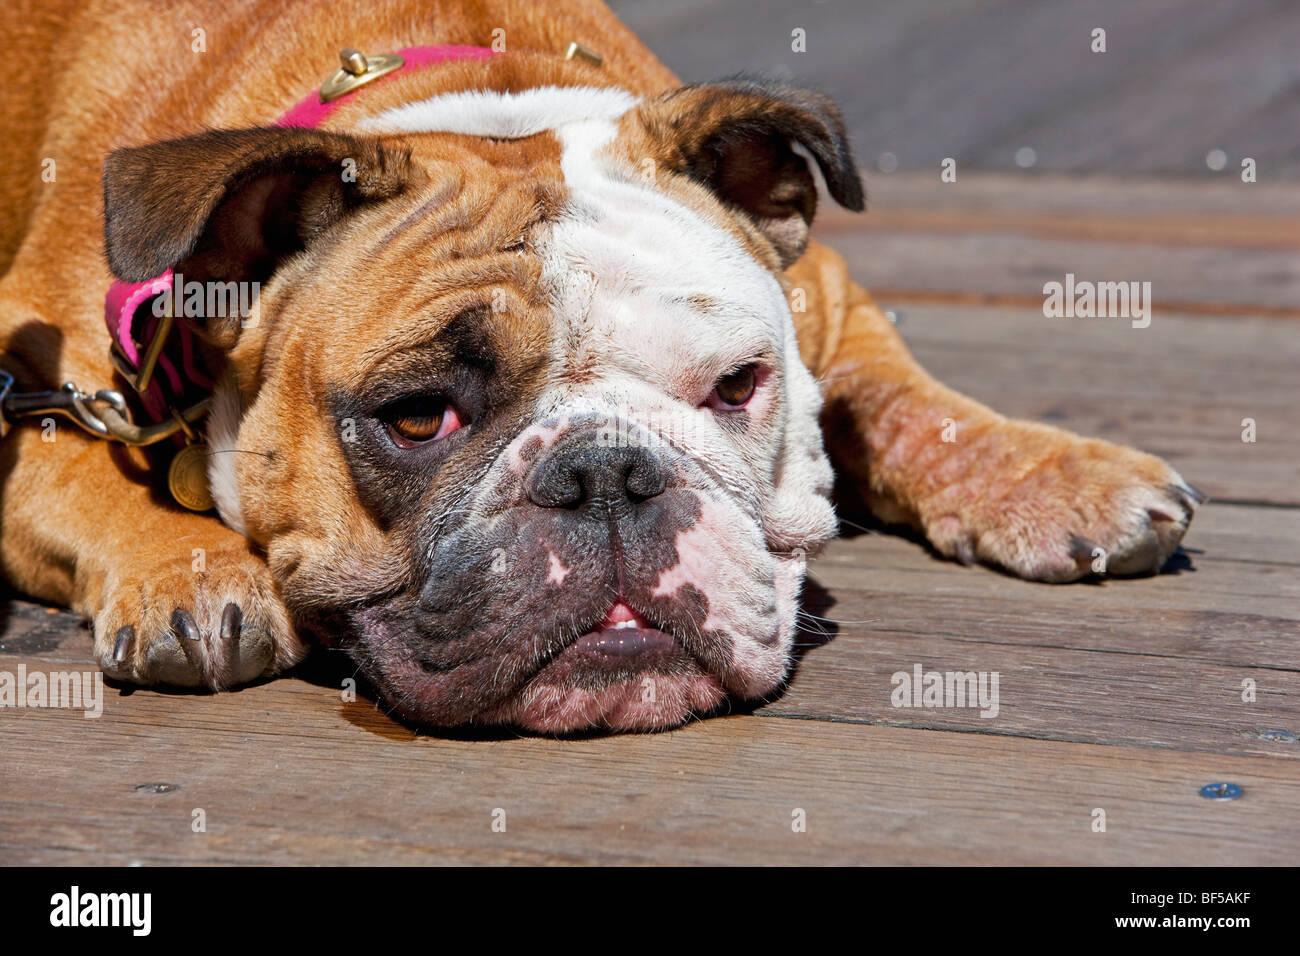 French Bulldog, San Francisco, California, USA, America - Stock Image